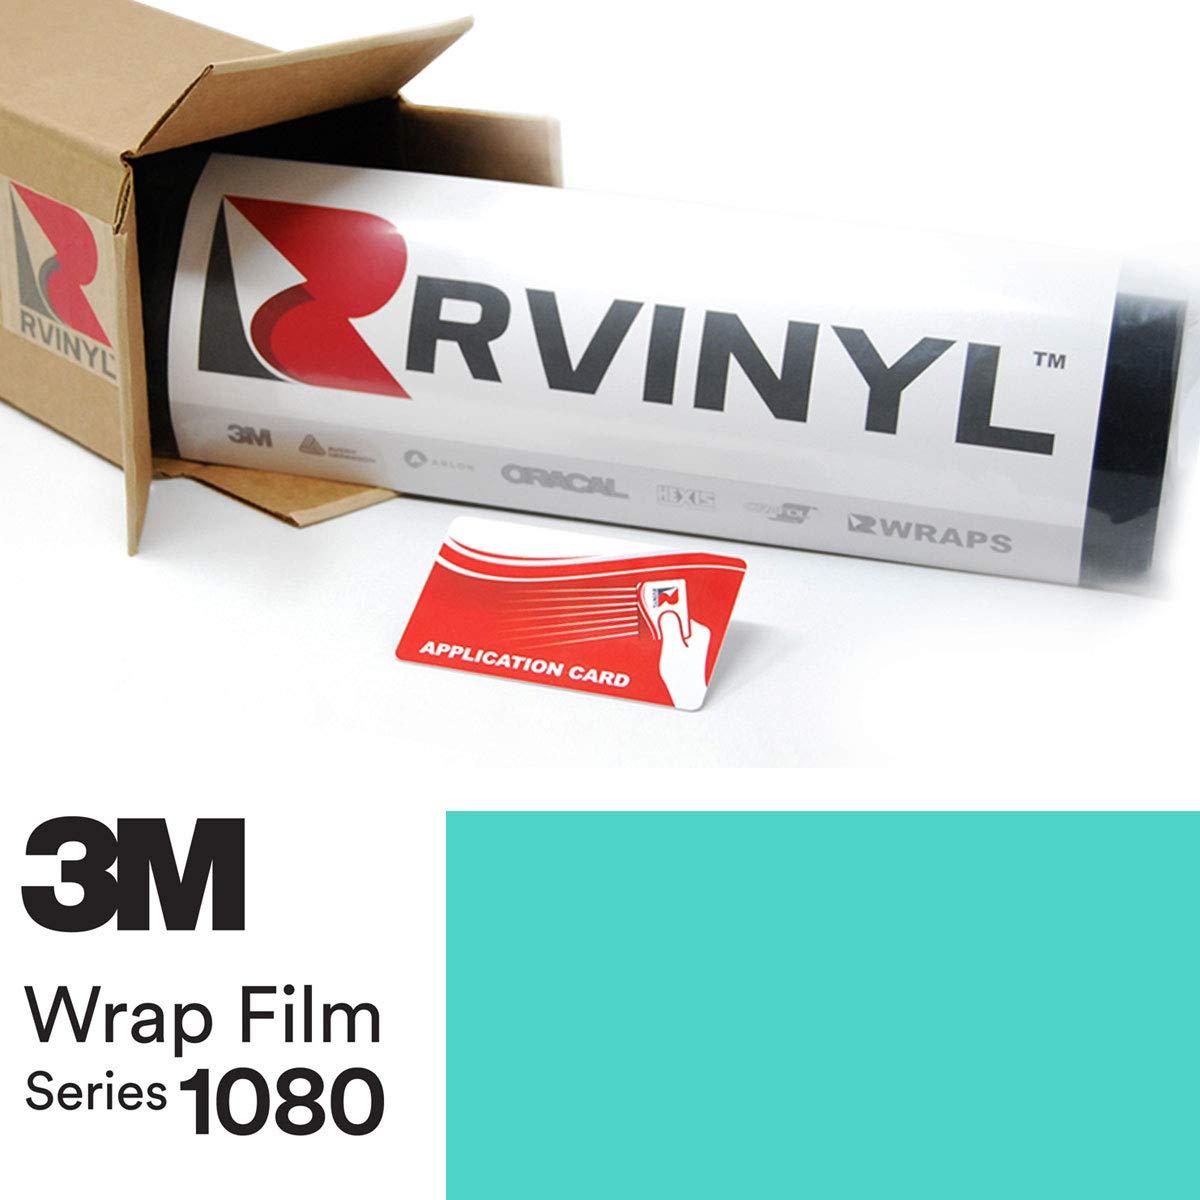 3M 1080 S57 Satin Key WEST 5ft x 1ft W/Application Card Vinyl Vehicle Car Wrap Film Sheet Roll by Rvinyl